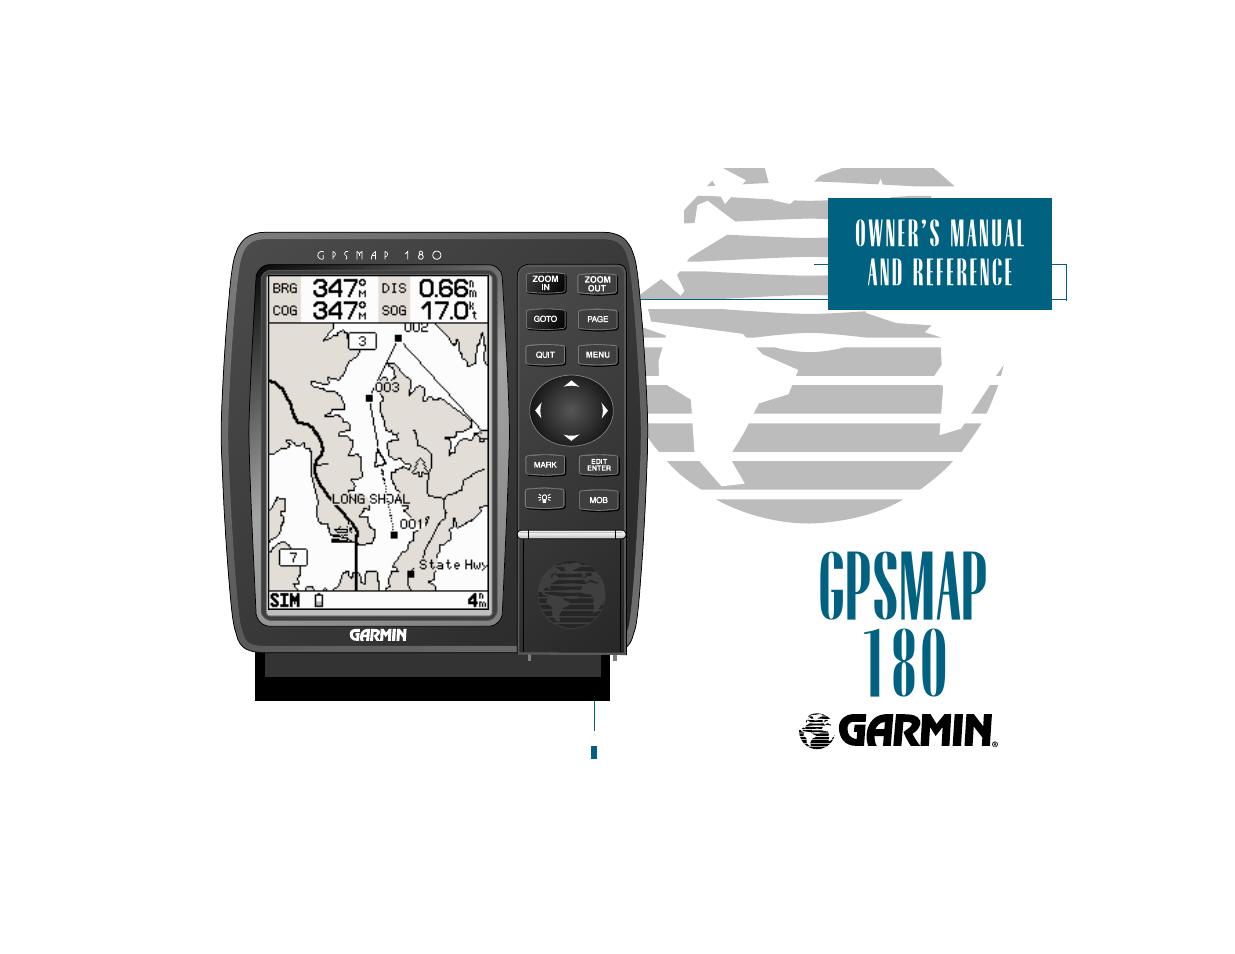 garmin gpsmap 180 user manual 96 pages rh manualsdir com Garmin Nuvi 50 Manual Garmin eTrex Manual PDF